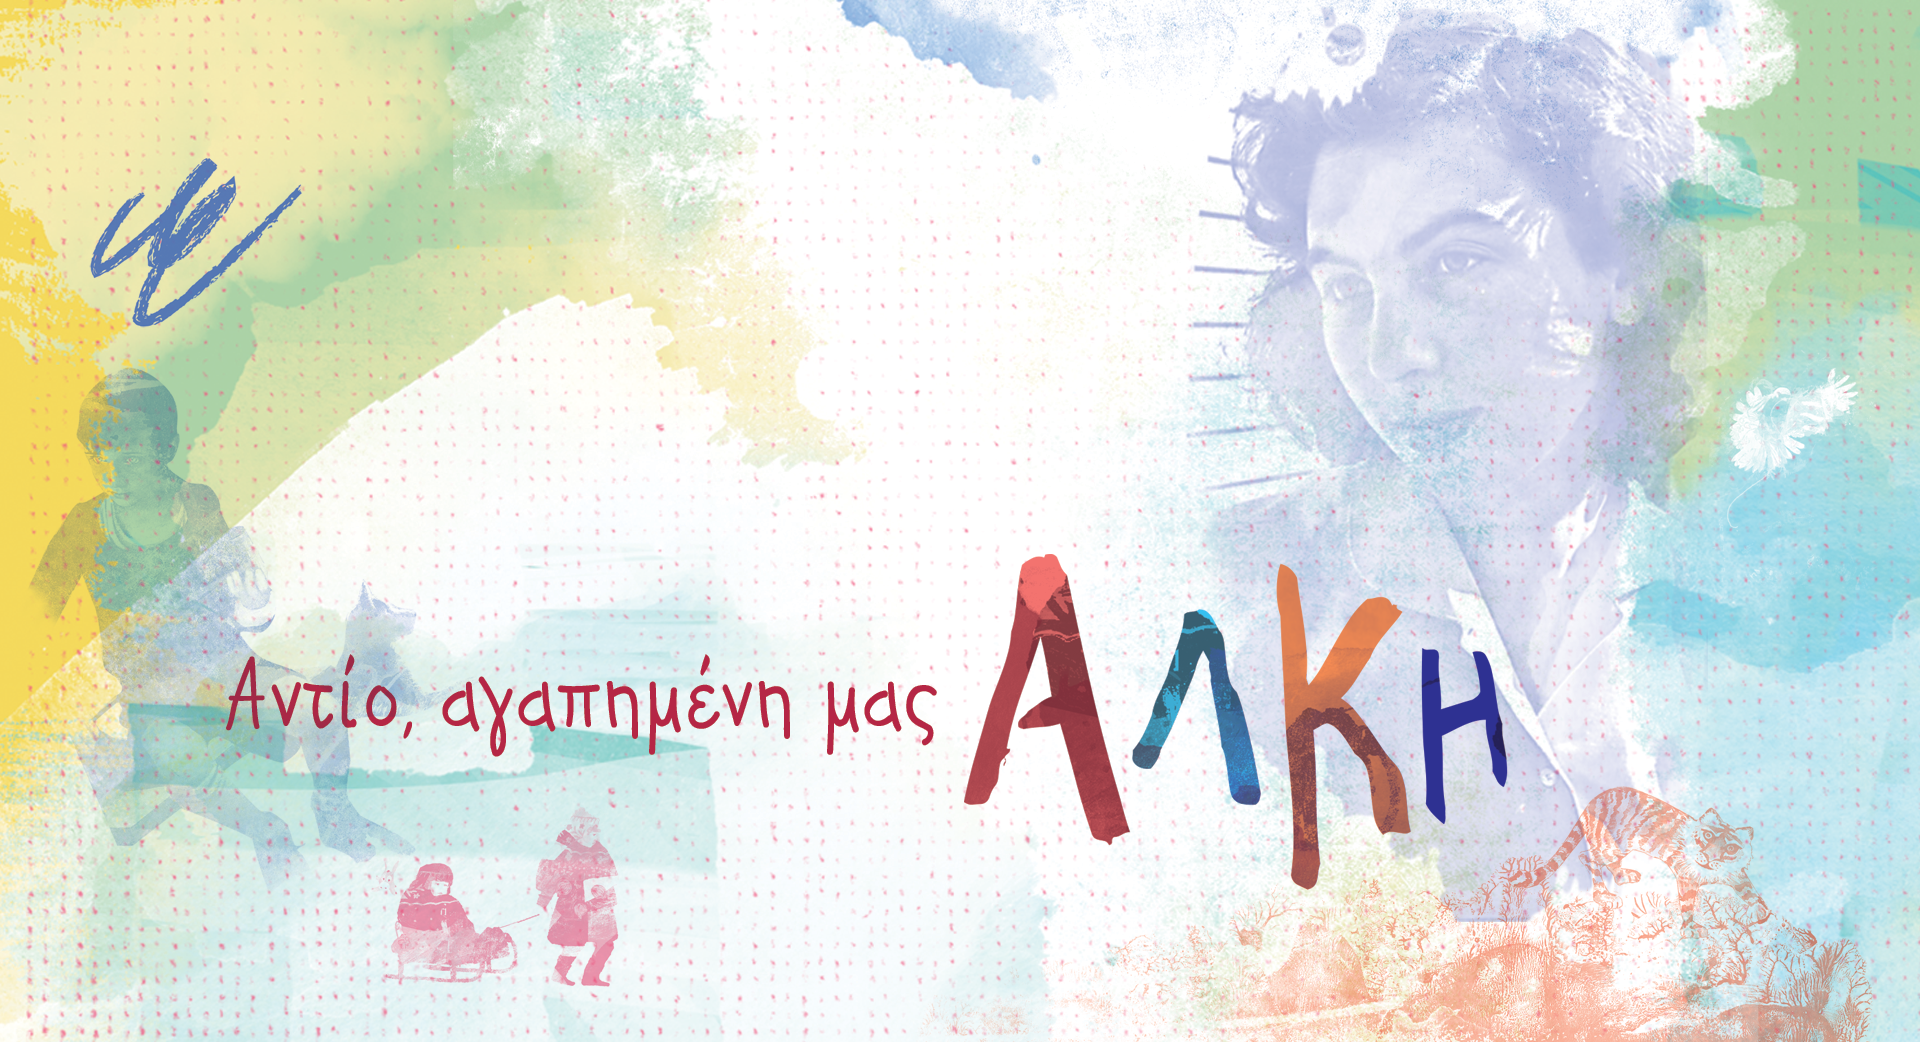 Alkh zeh kentriko banner 1920x1042